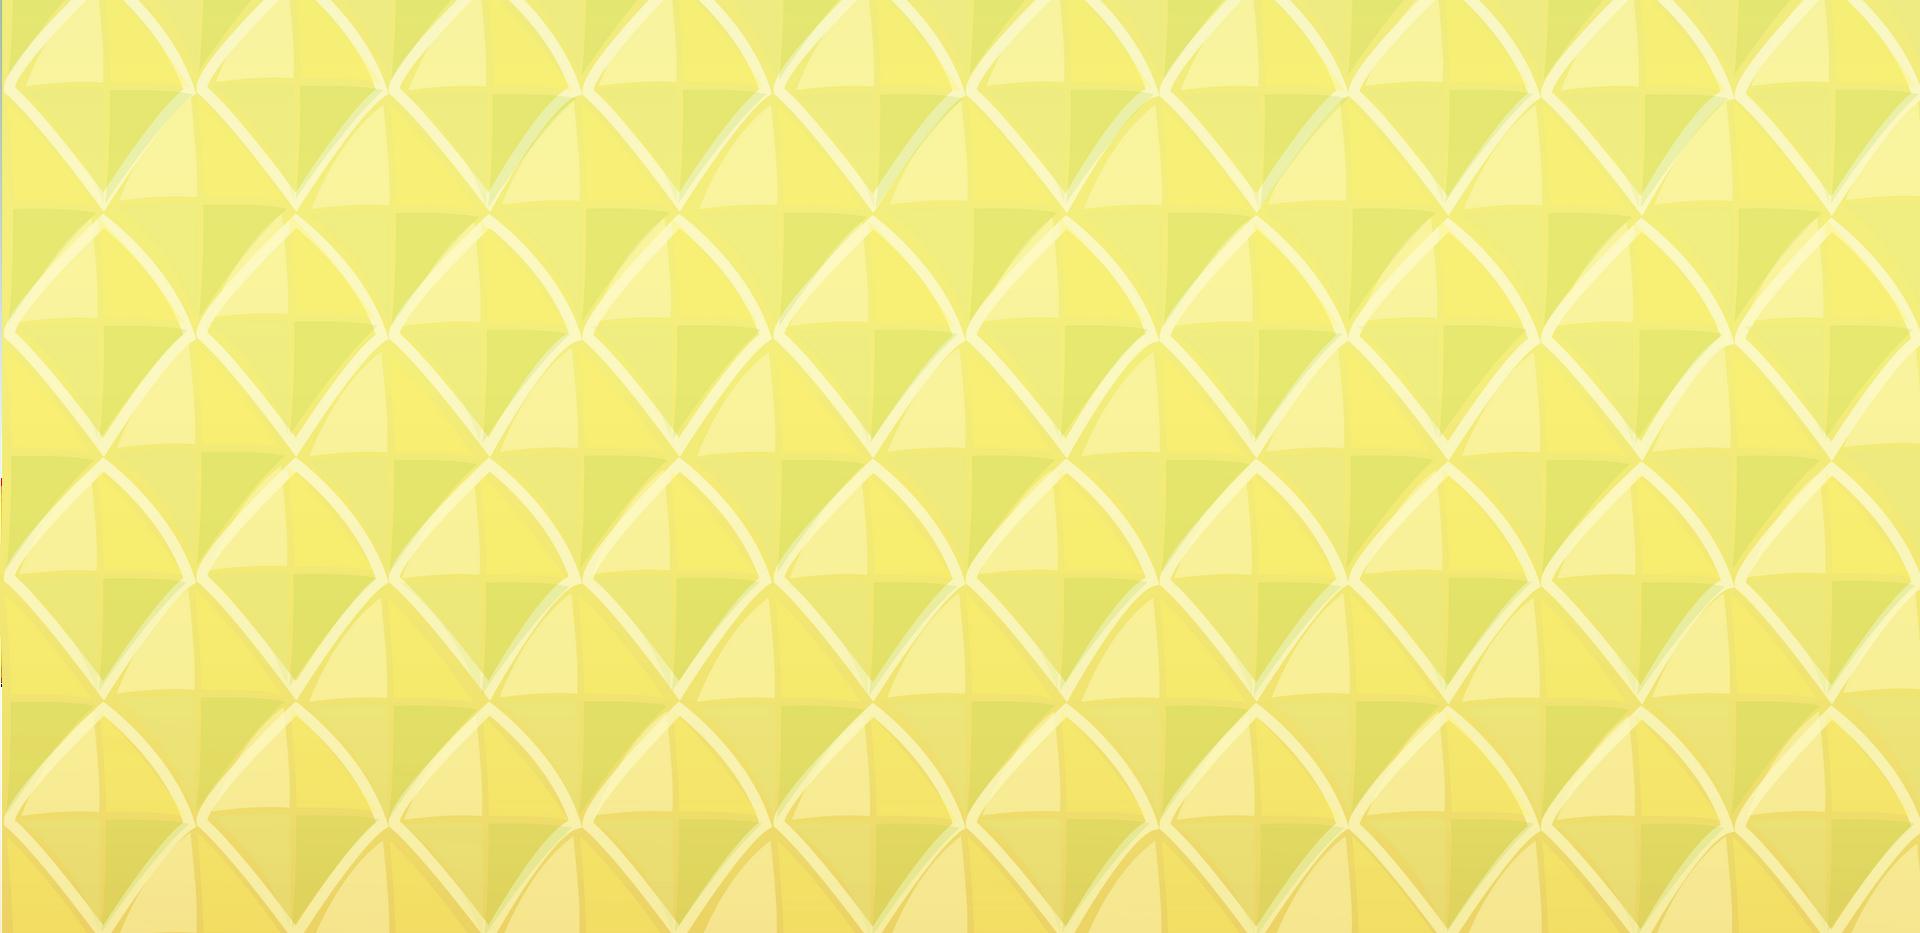 FLIP Apparel Co. | Pineapple Textile